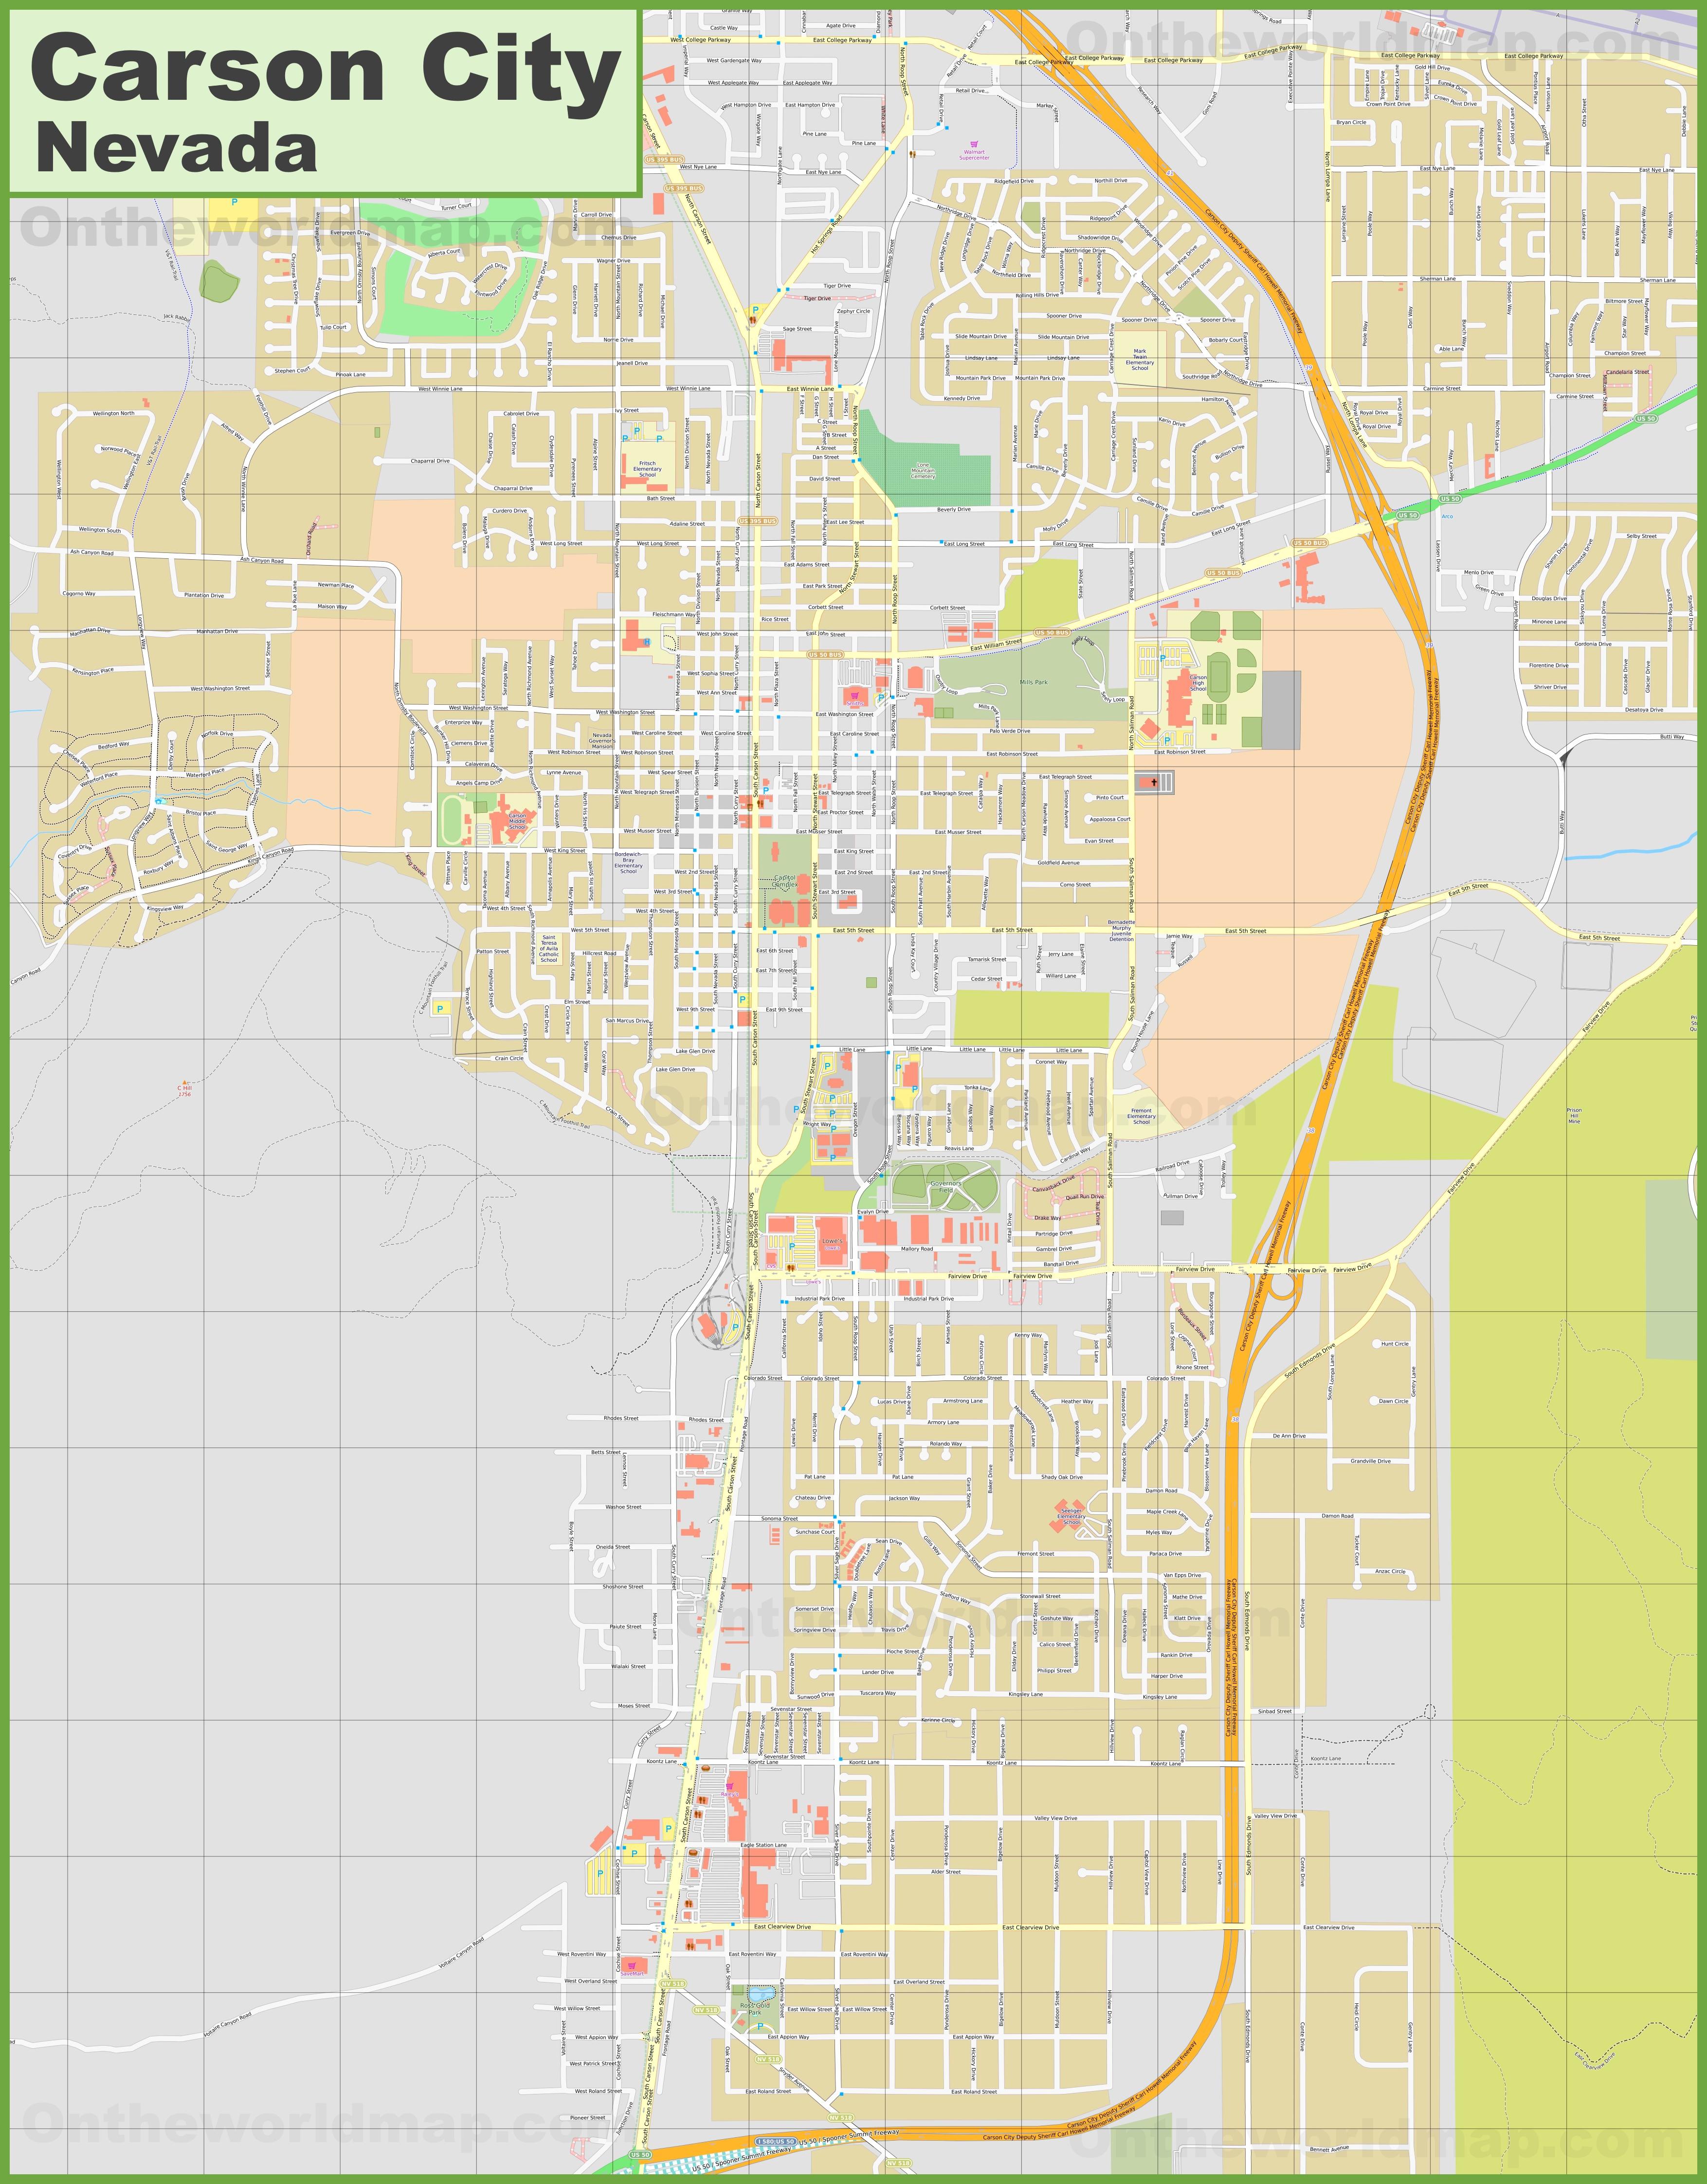 Carson City Maps | Nevada, U.S. | Maps of Carson City